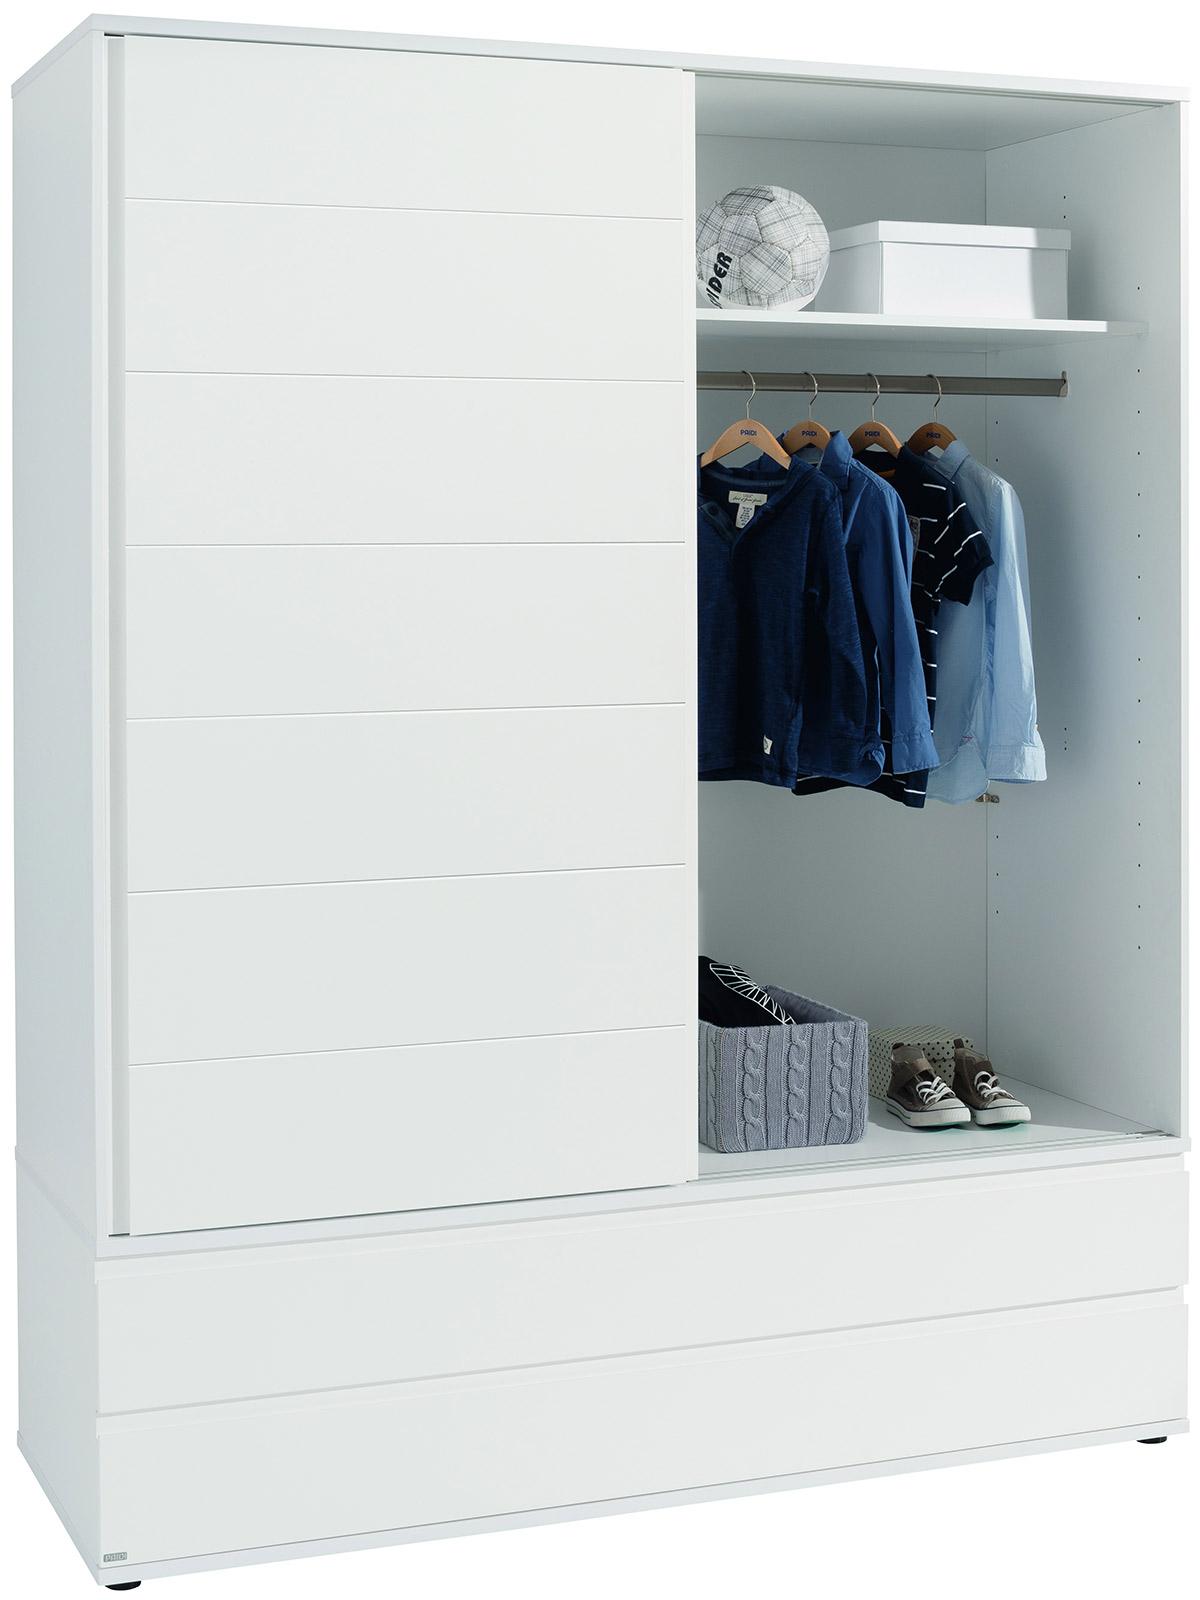 Белый шкаф-купе с ящиками внизу Paidi Fiona